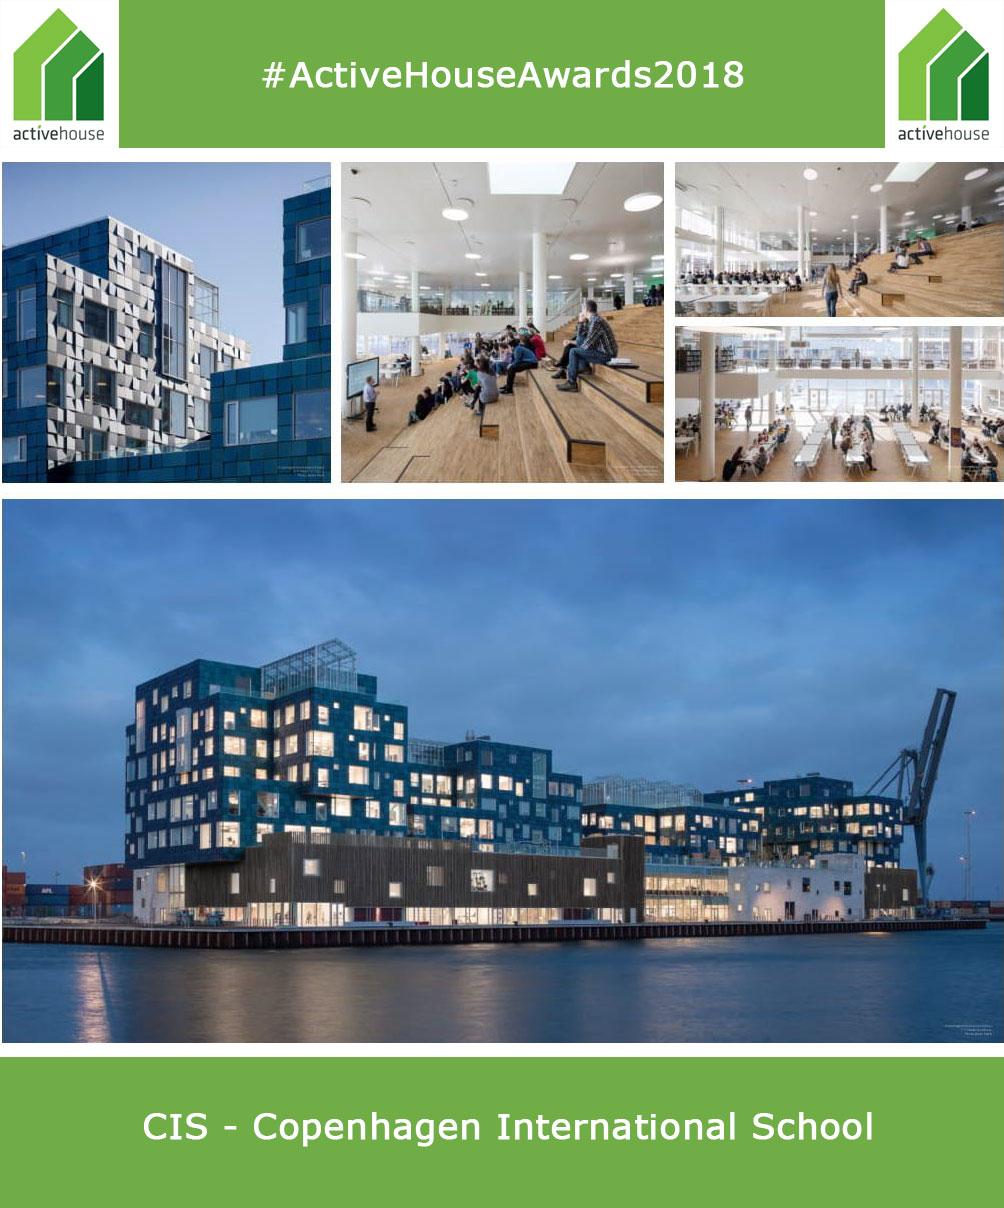 CIS - Copenhagen International School